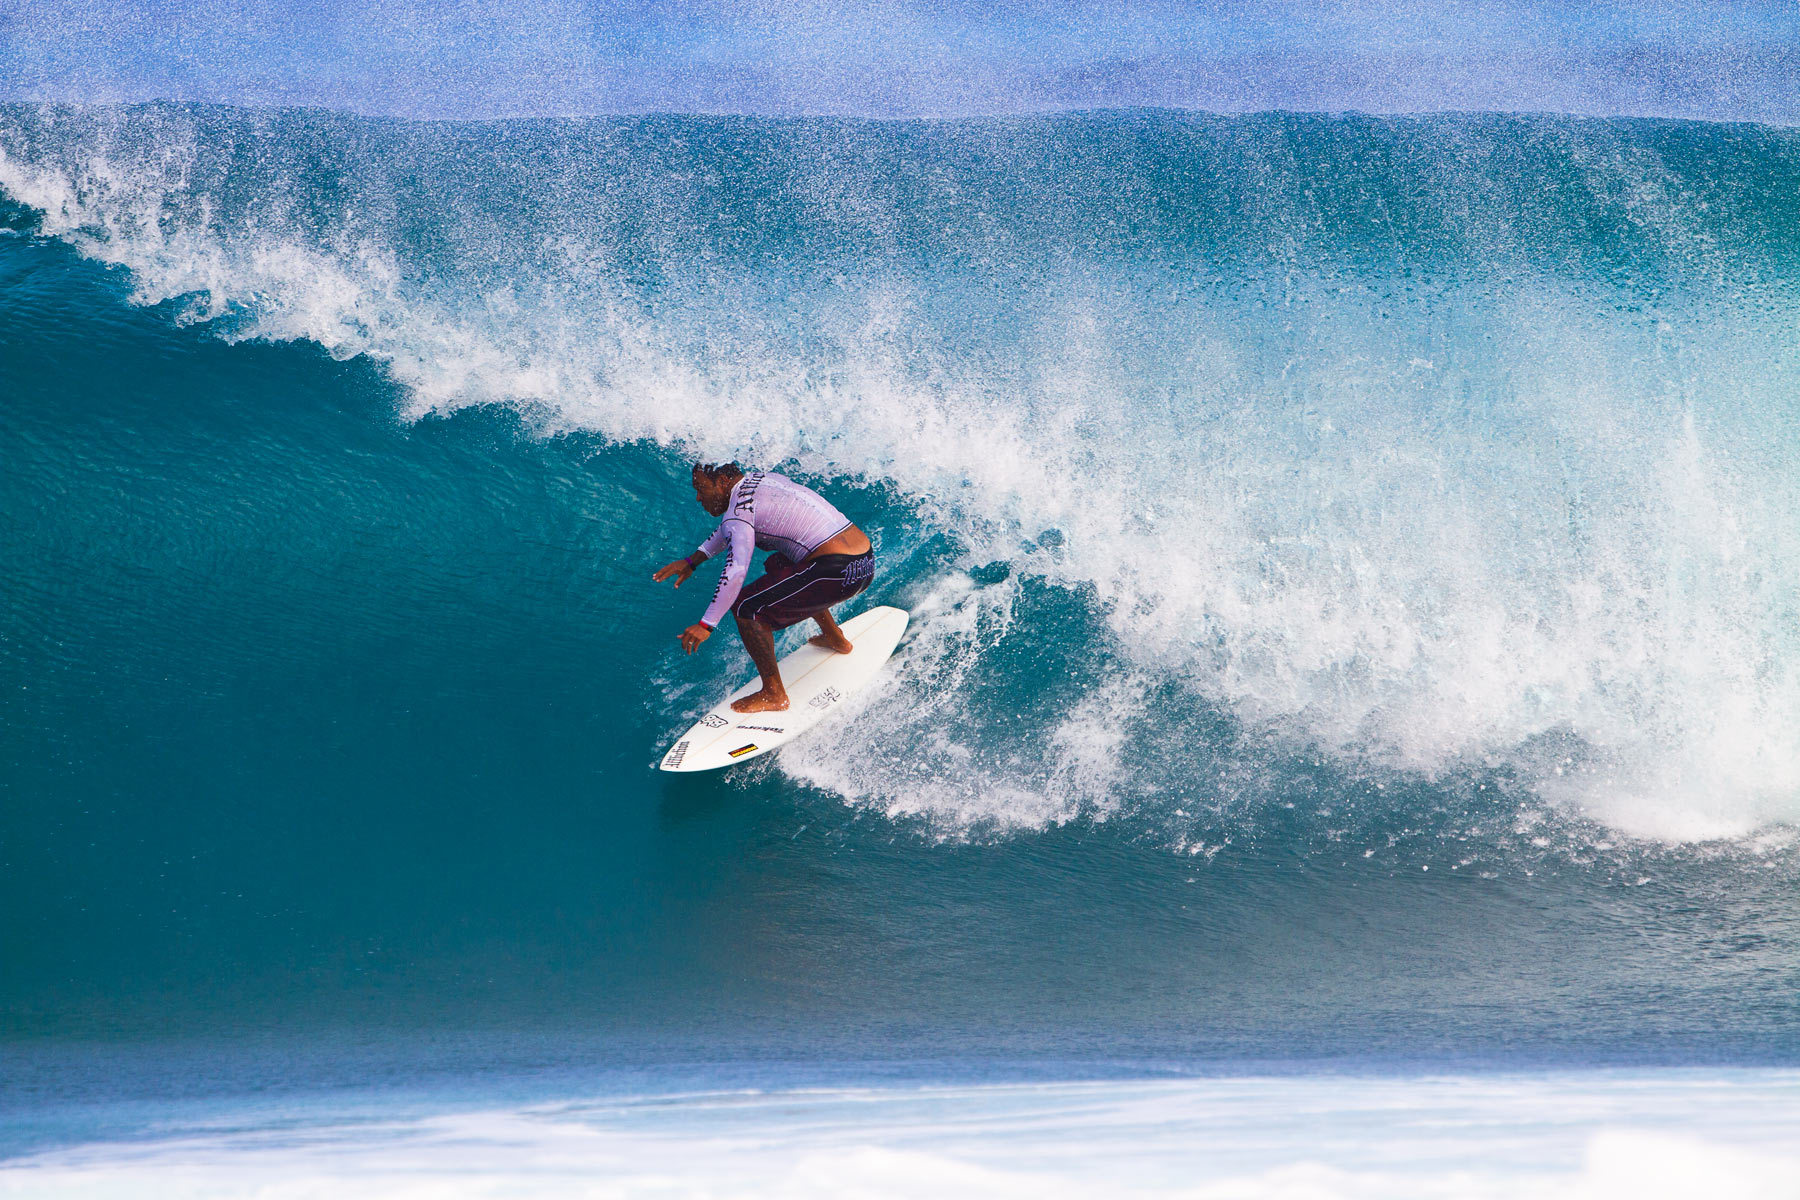 Sunny GarciaWorld Champion Surfing LegendBackdoor / Banzai PipelineNorth Shore, OahuHawaii